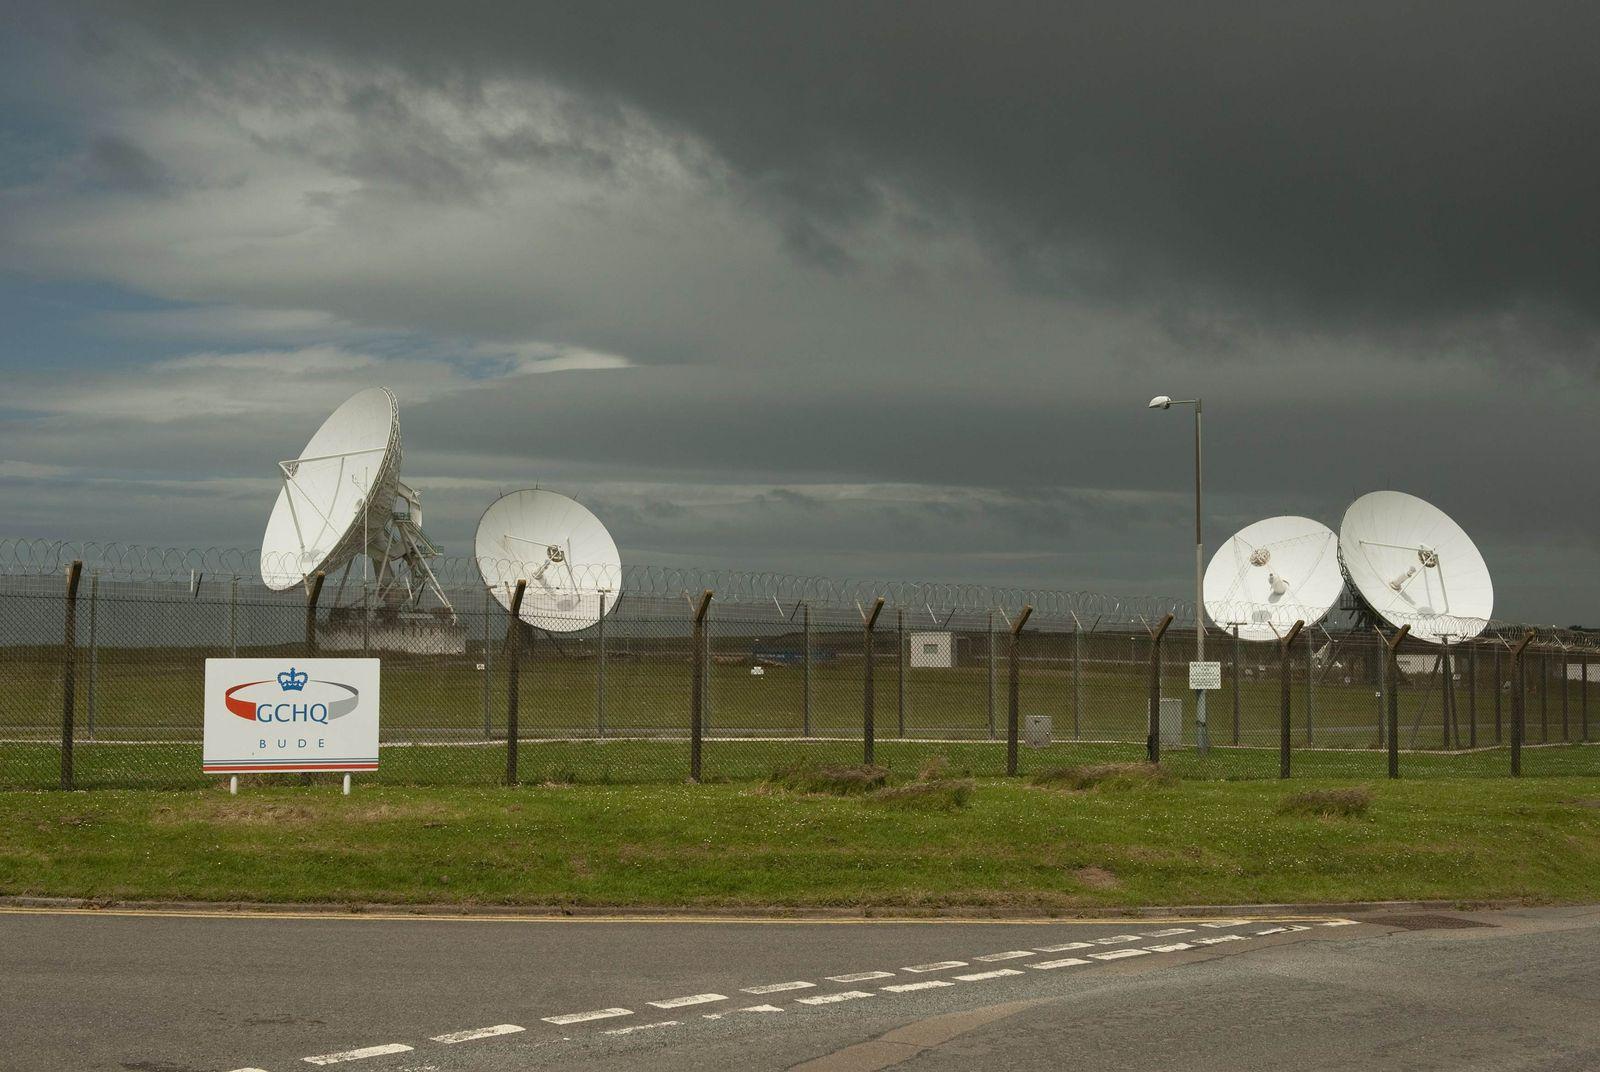 GCHQ-Basis in Cornwall